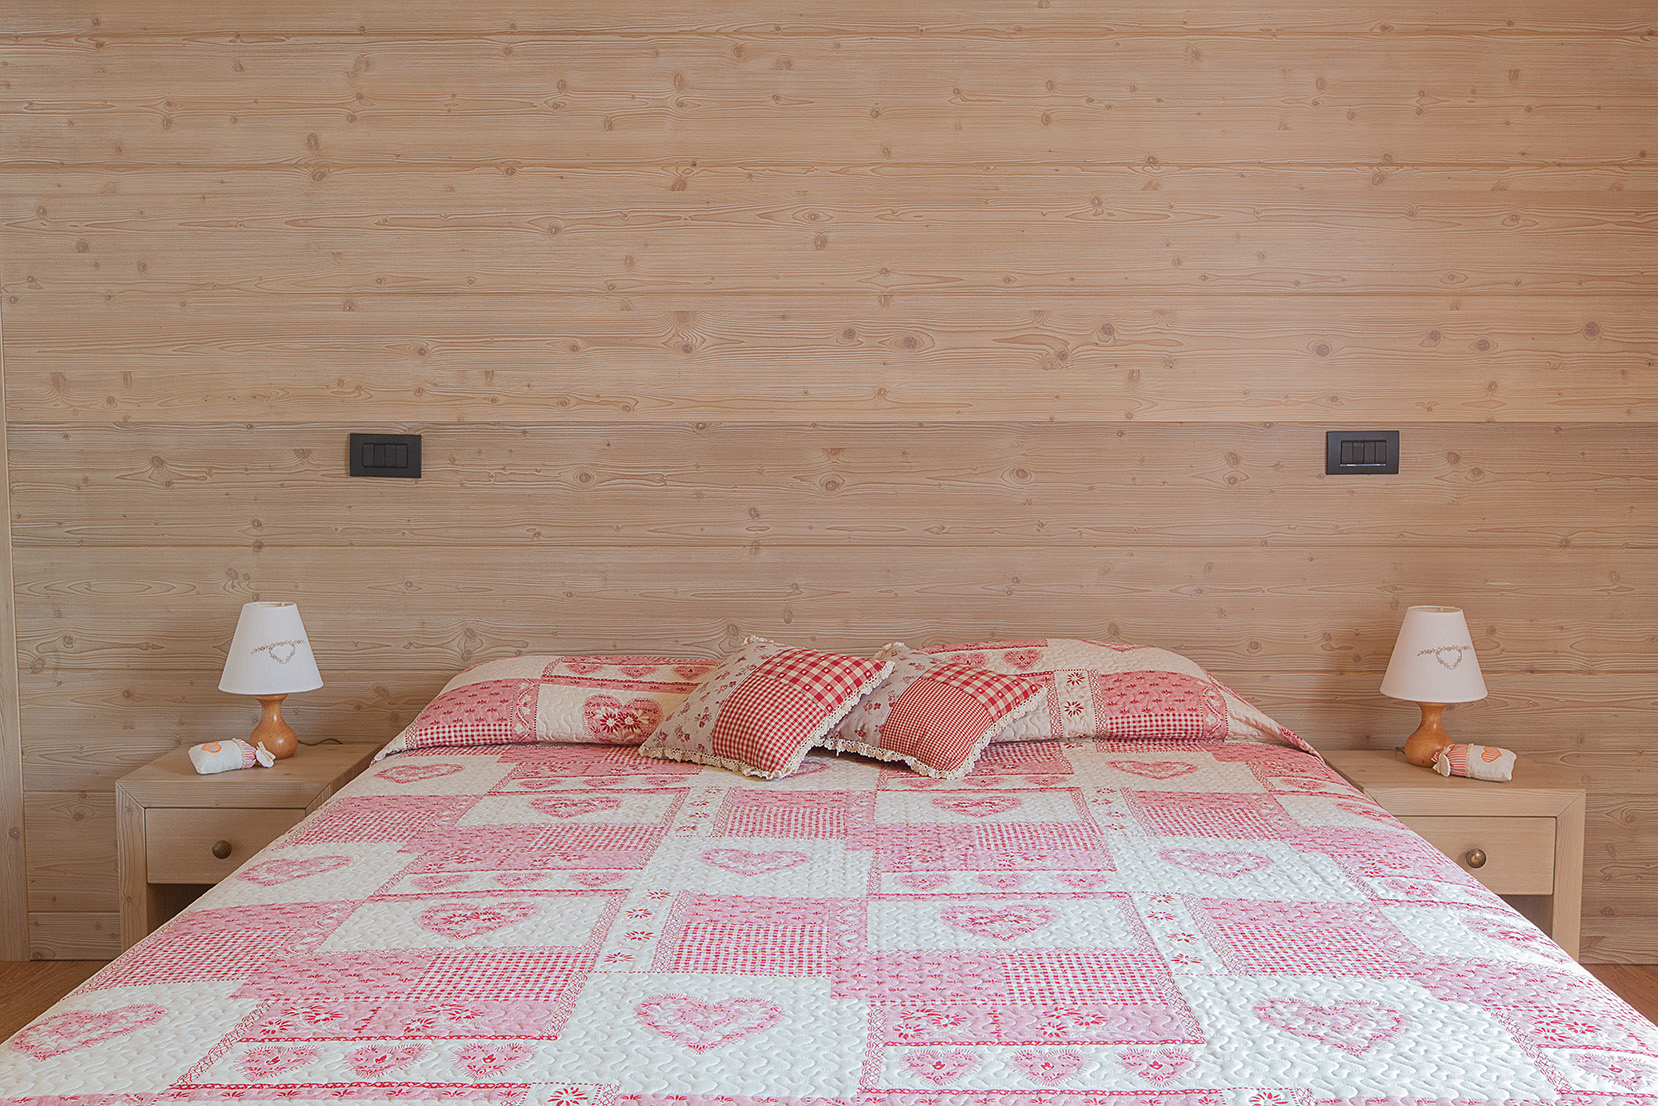 ... Schlafzimmer Umrandung By Contract Schlafzimmer 12 Madeinitaly De ...